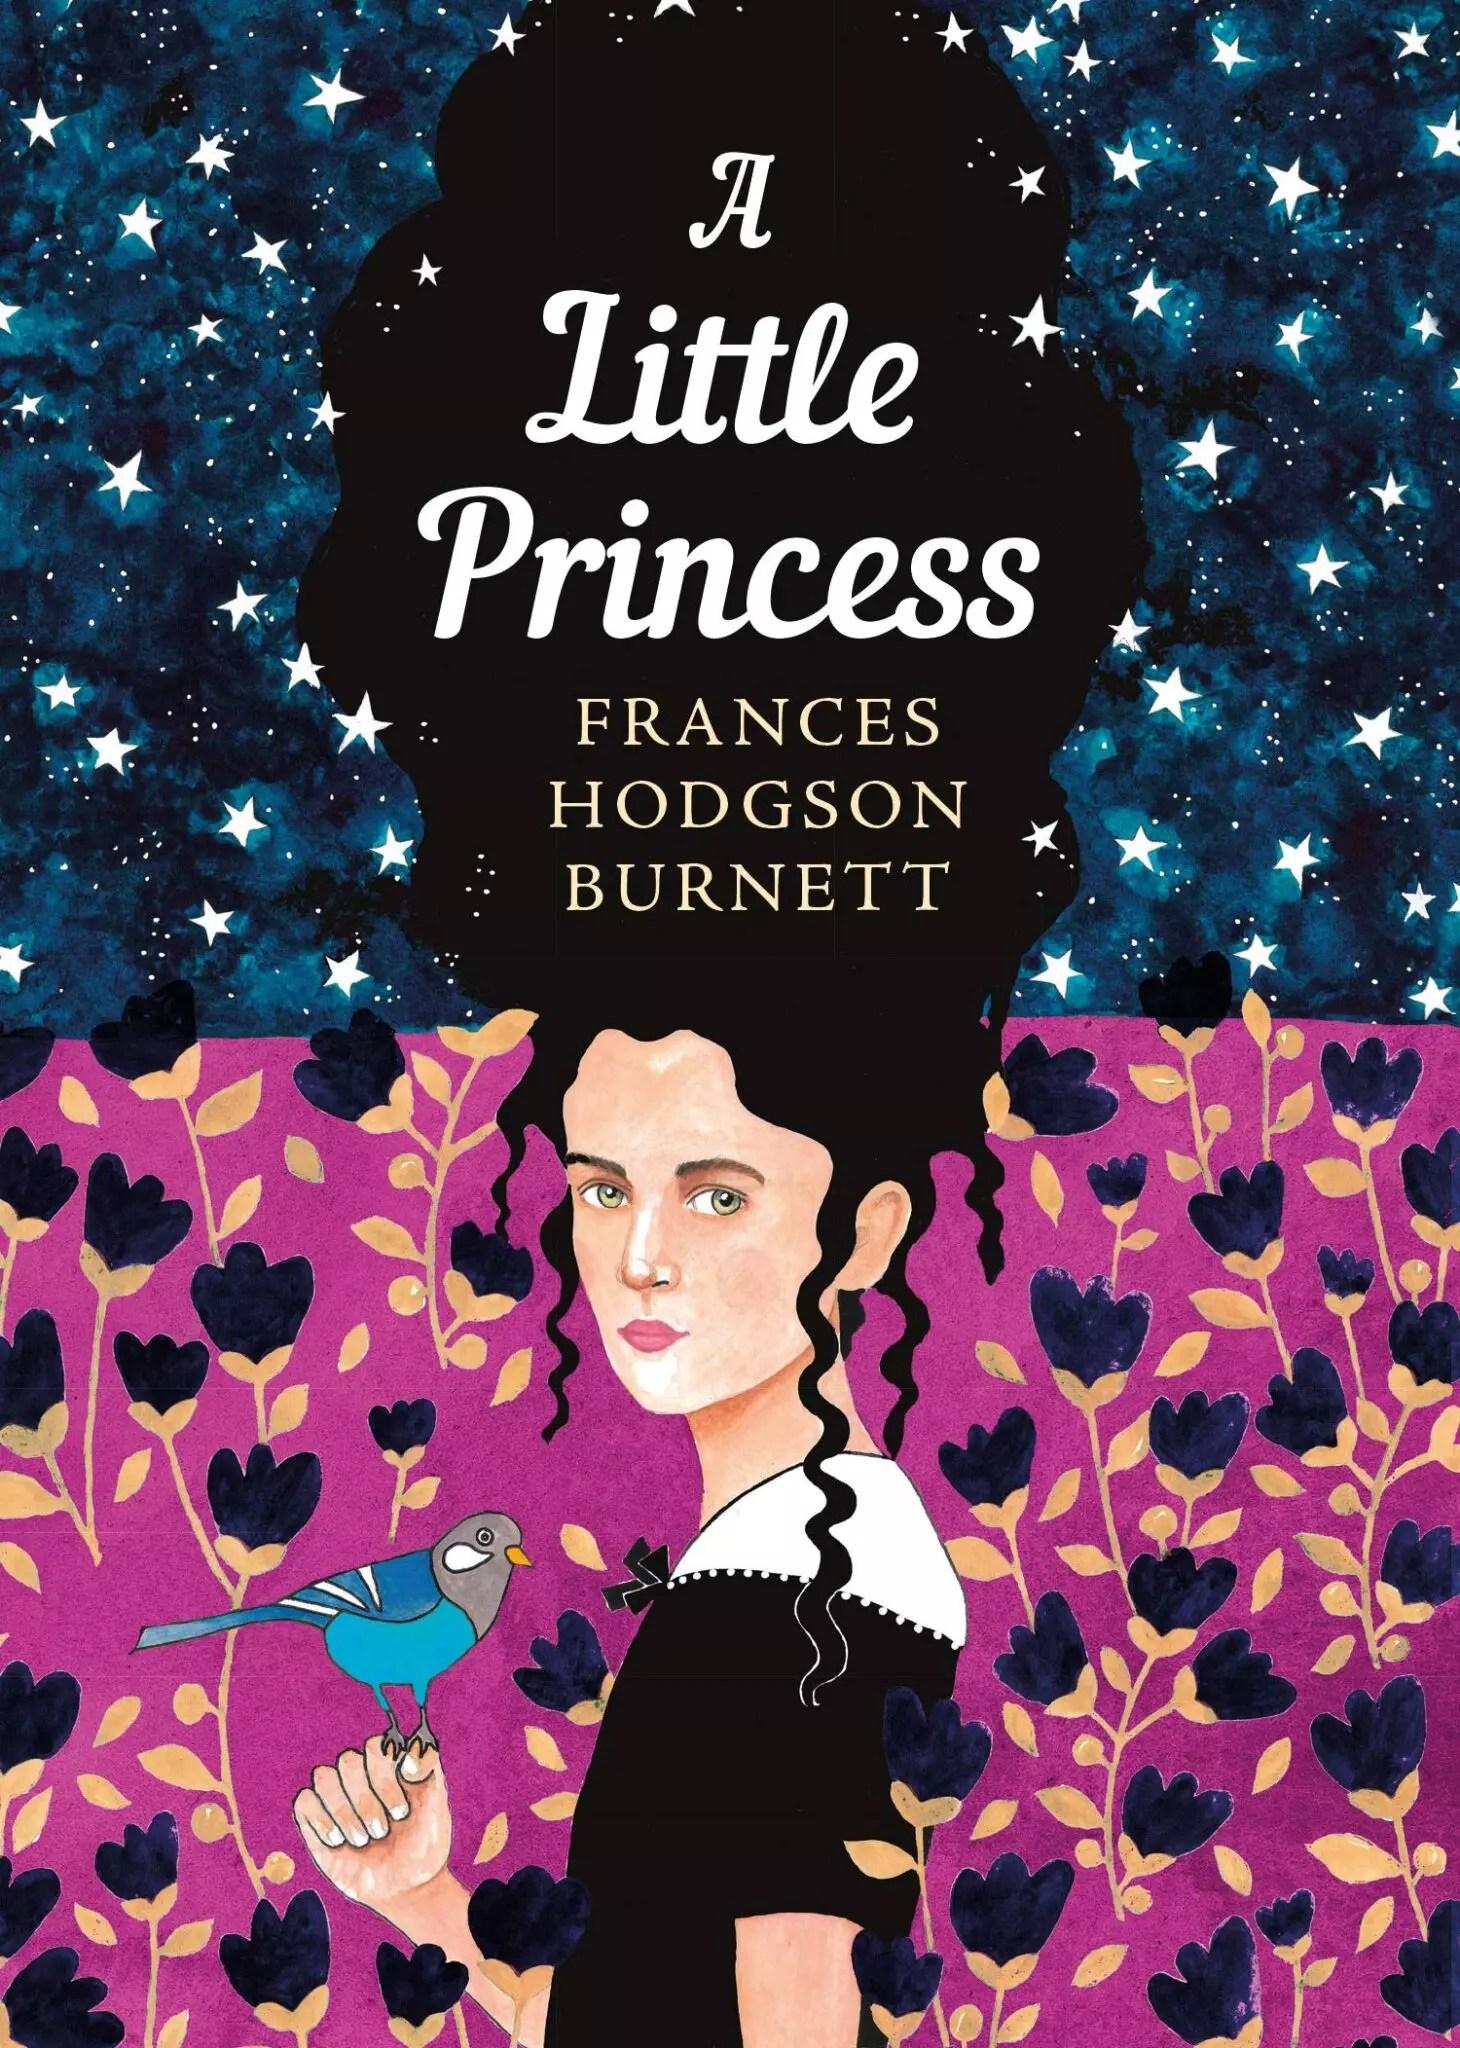 a little princess frances hodgson burnett sisterhood collection